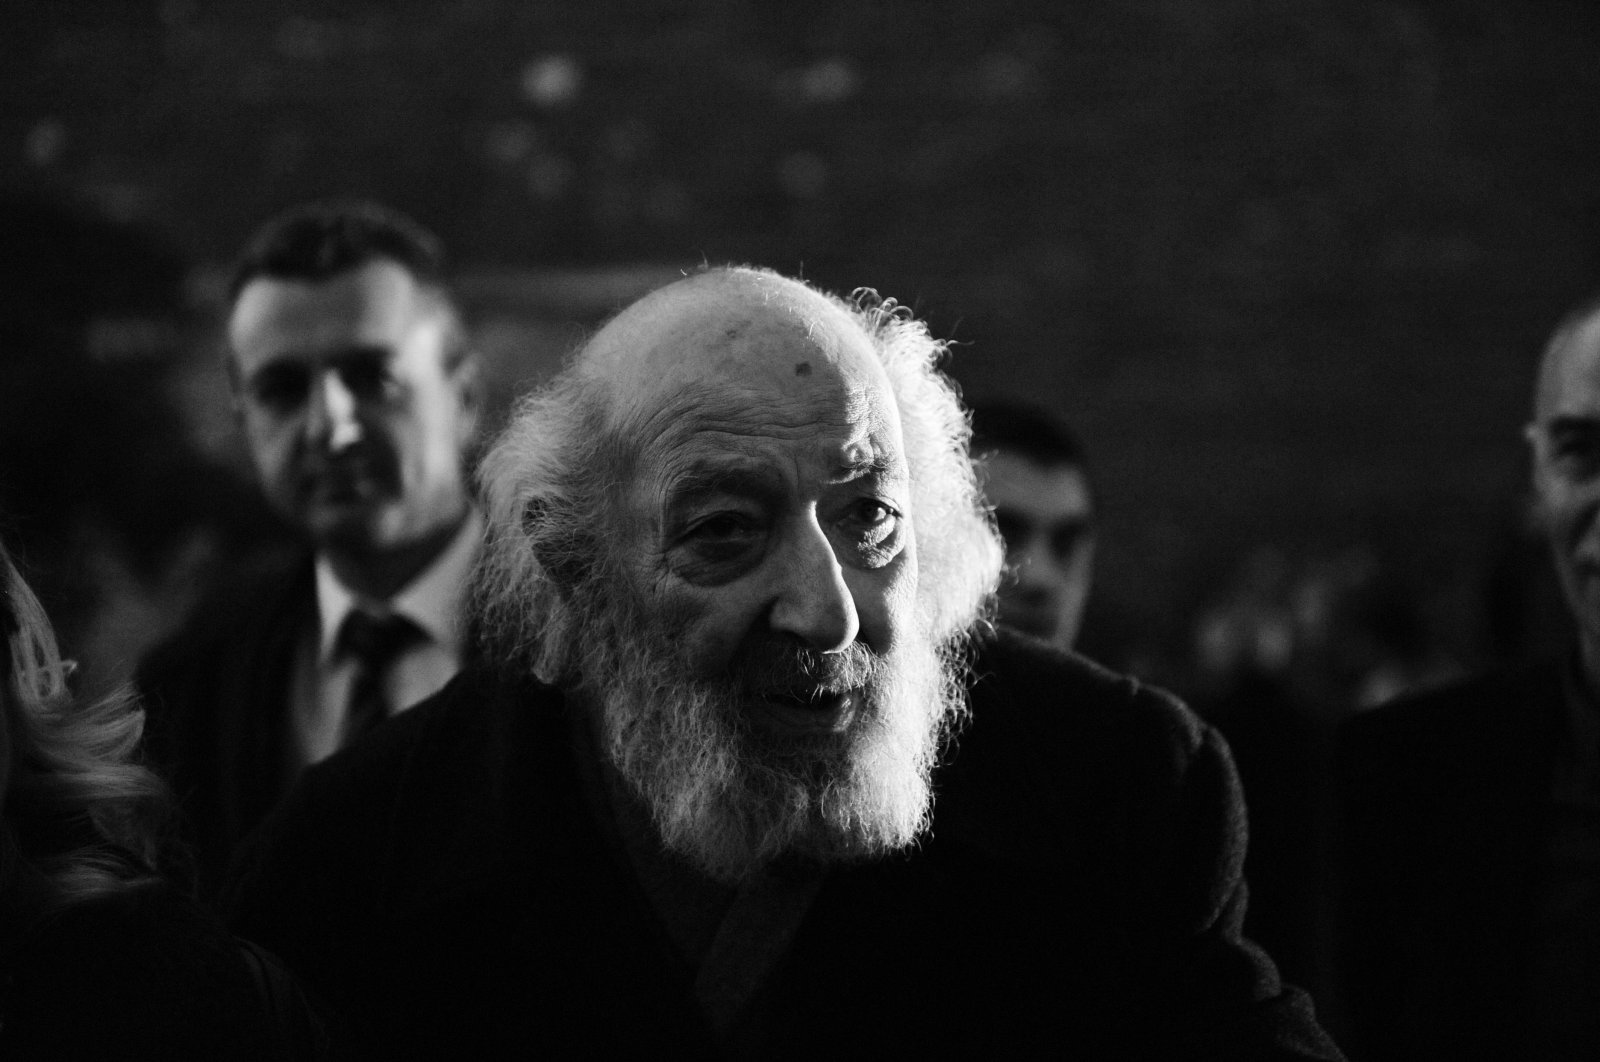 Ara Güler photographed during the honorary doctorate of Mimar Sinan Fine Arts University (MSGSÜ) in Istanbul, March 5, 2013. (Photo by İlhami Yıldırım)